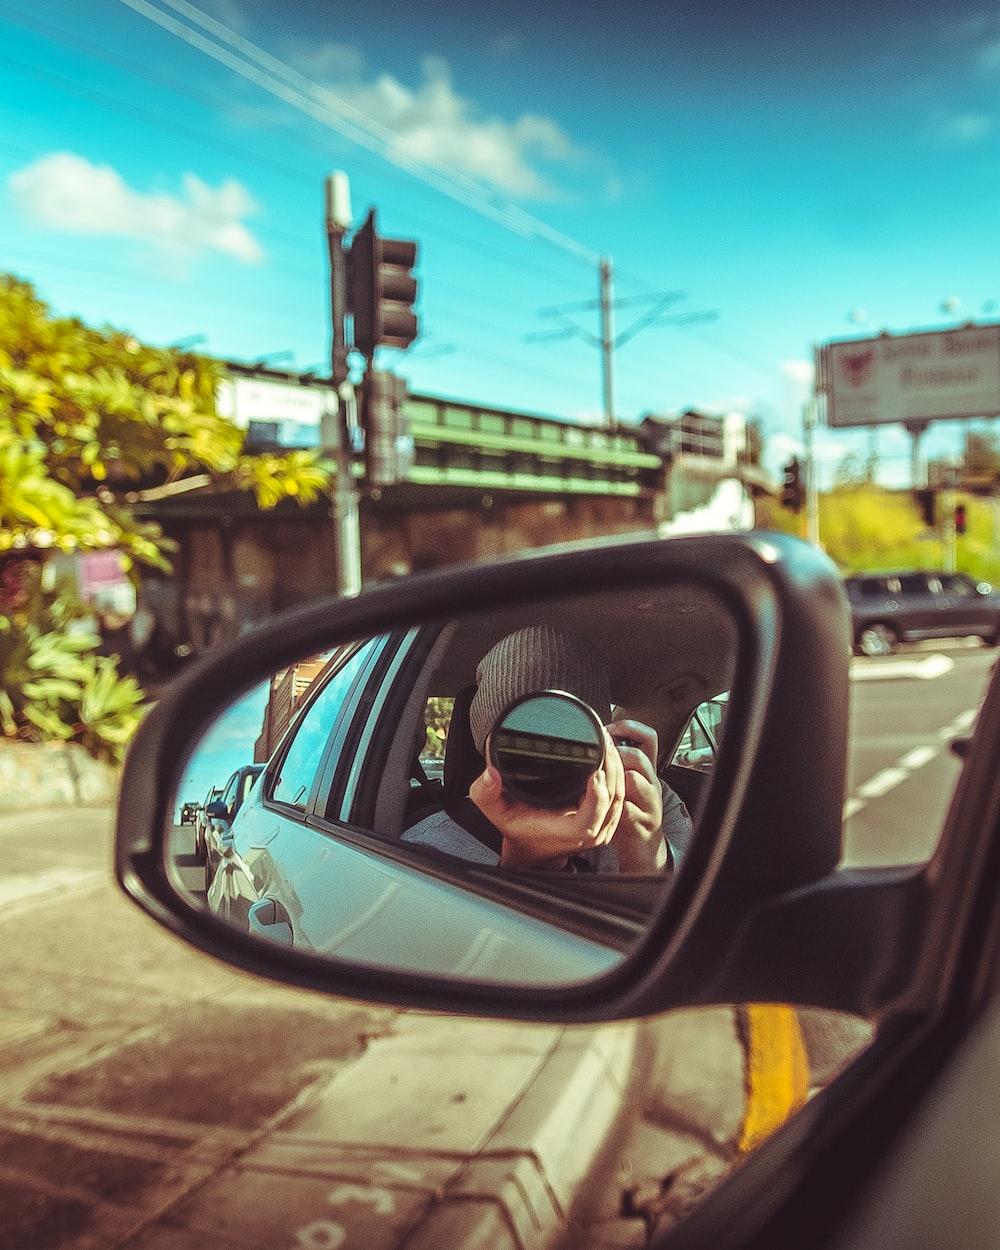 man taking photo of vehicle side mirror